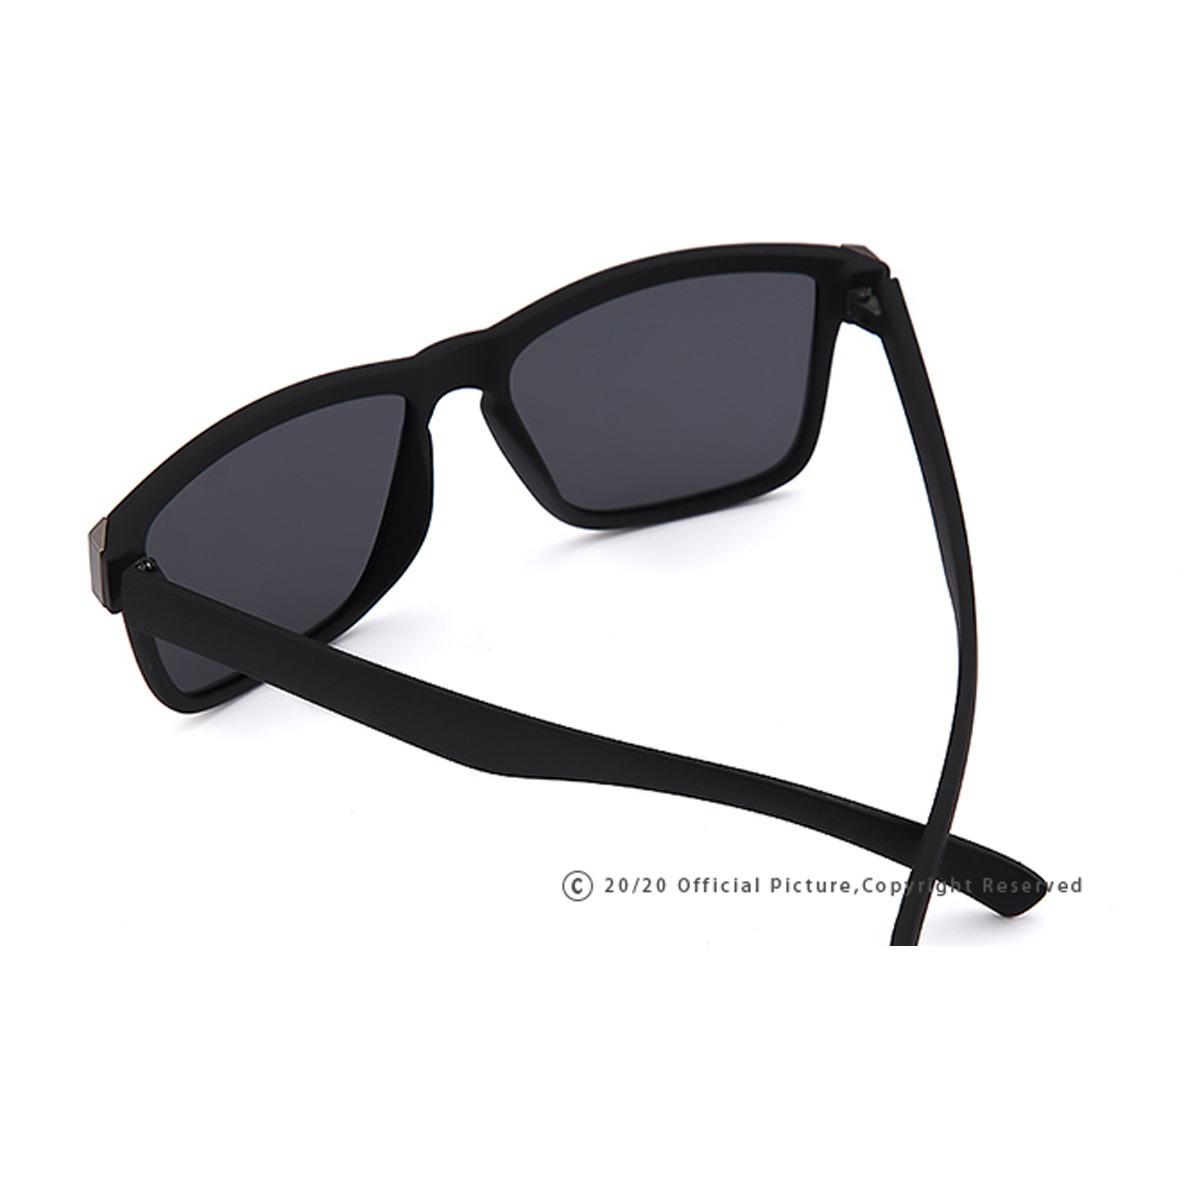 3a2cd2725f756 oculos sol masculino barato 2020 polarizado redondo vintage. Carregando  zoom.